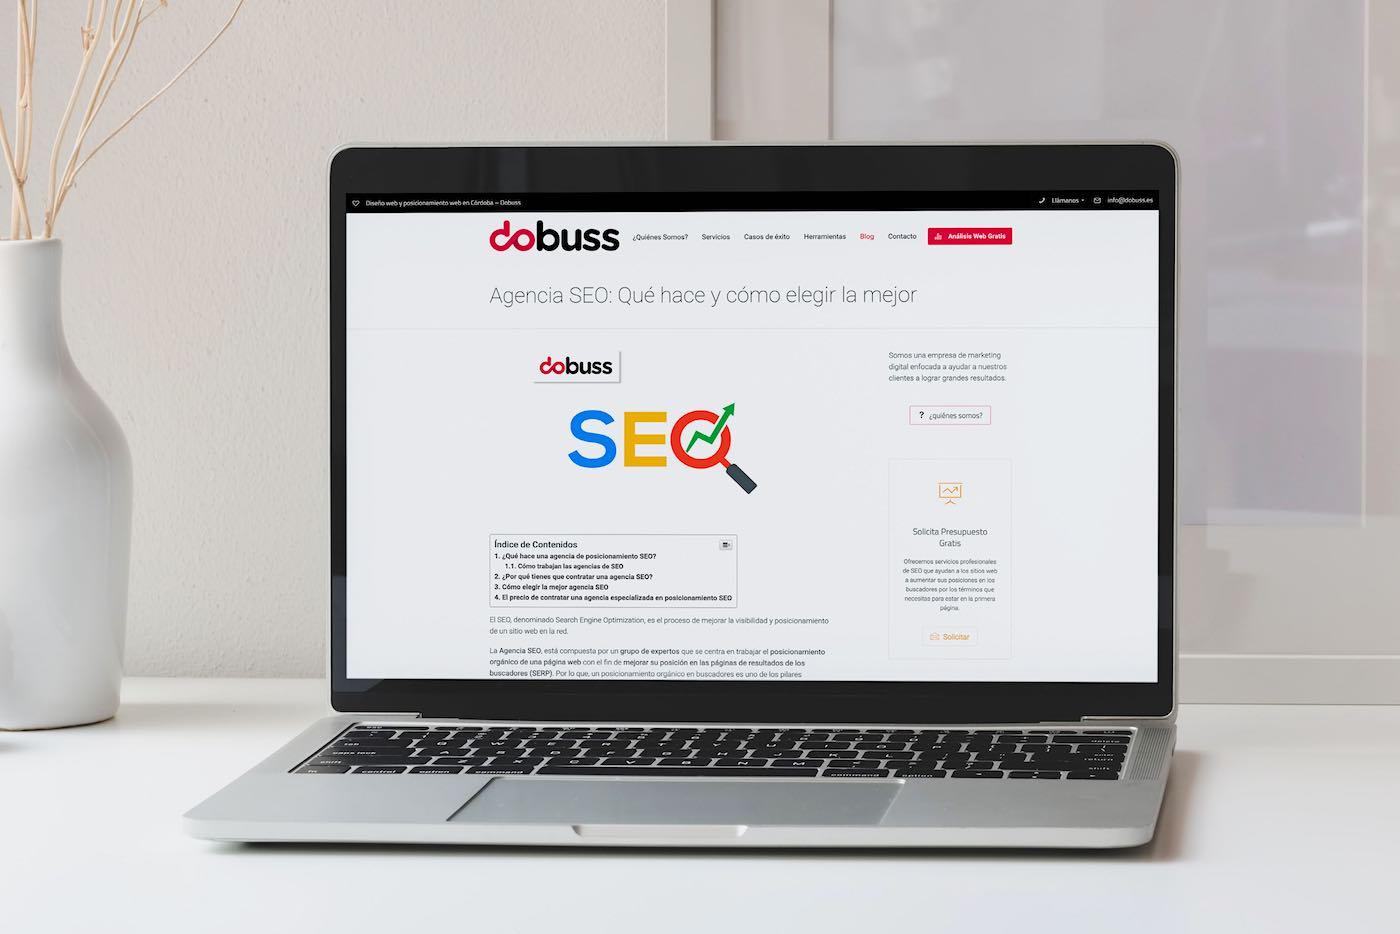 Las 10 mejores agencias SEO de España en Google según SEMRush